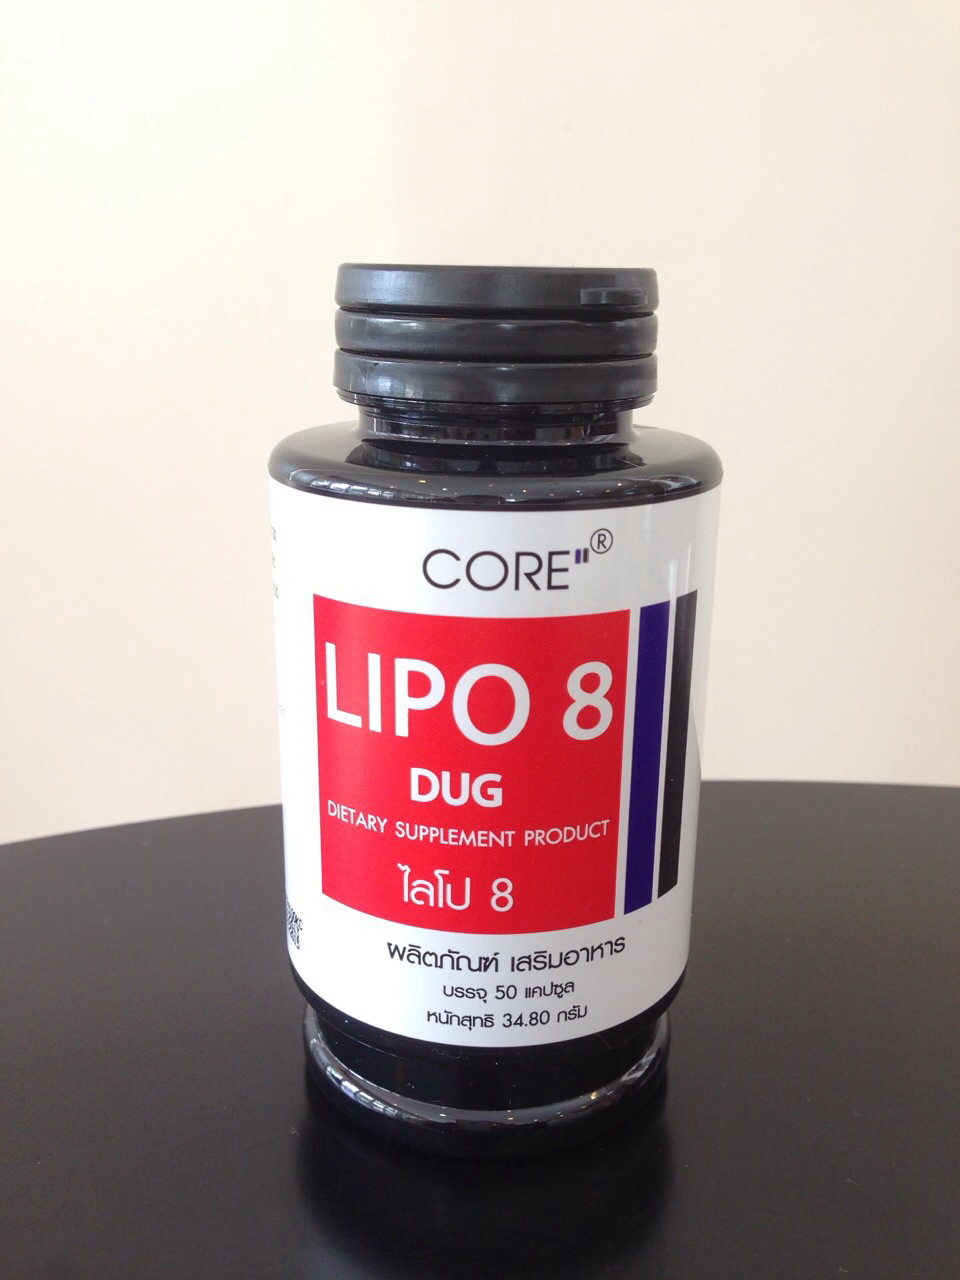 LIPO 8 (ไลโป 8) อาหารเสริมยาดักจับไขมัน